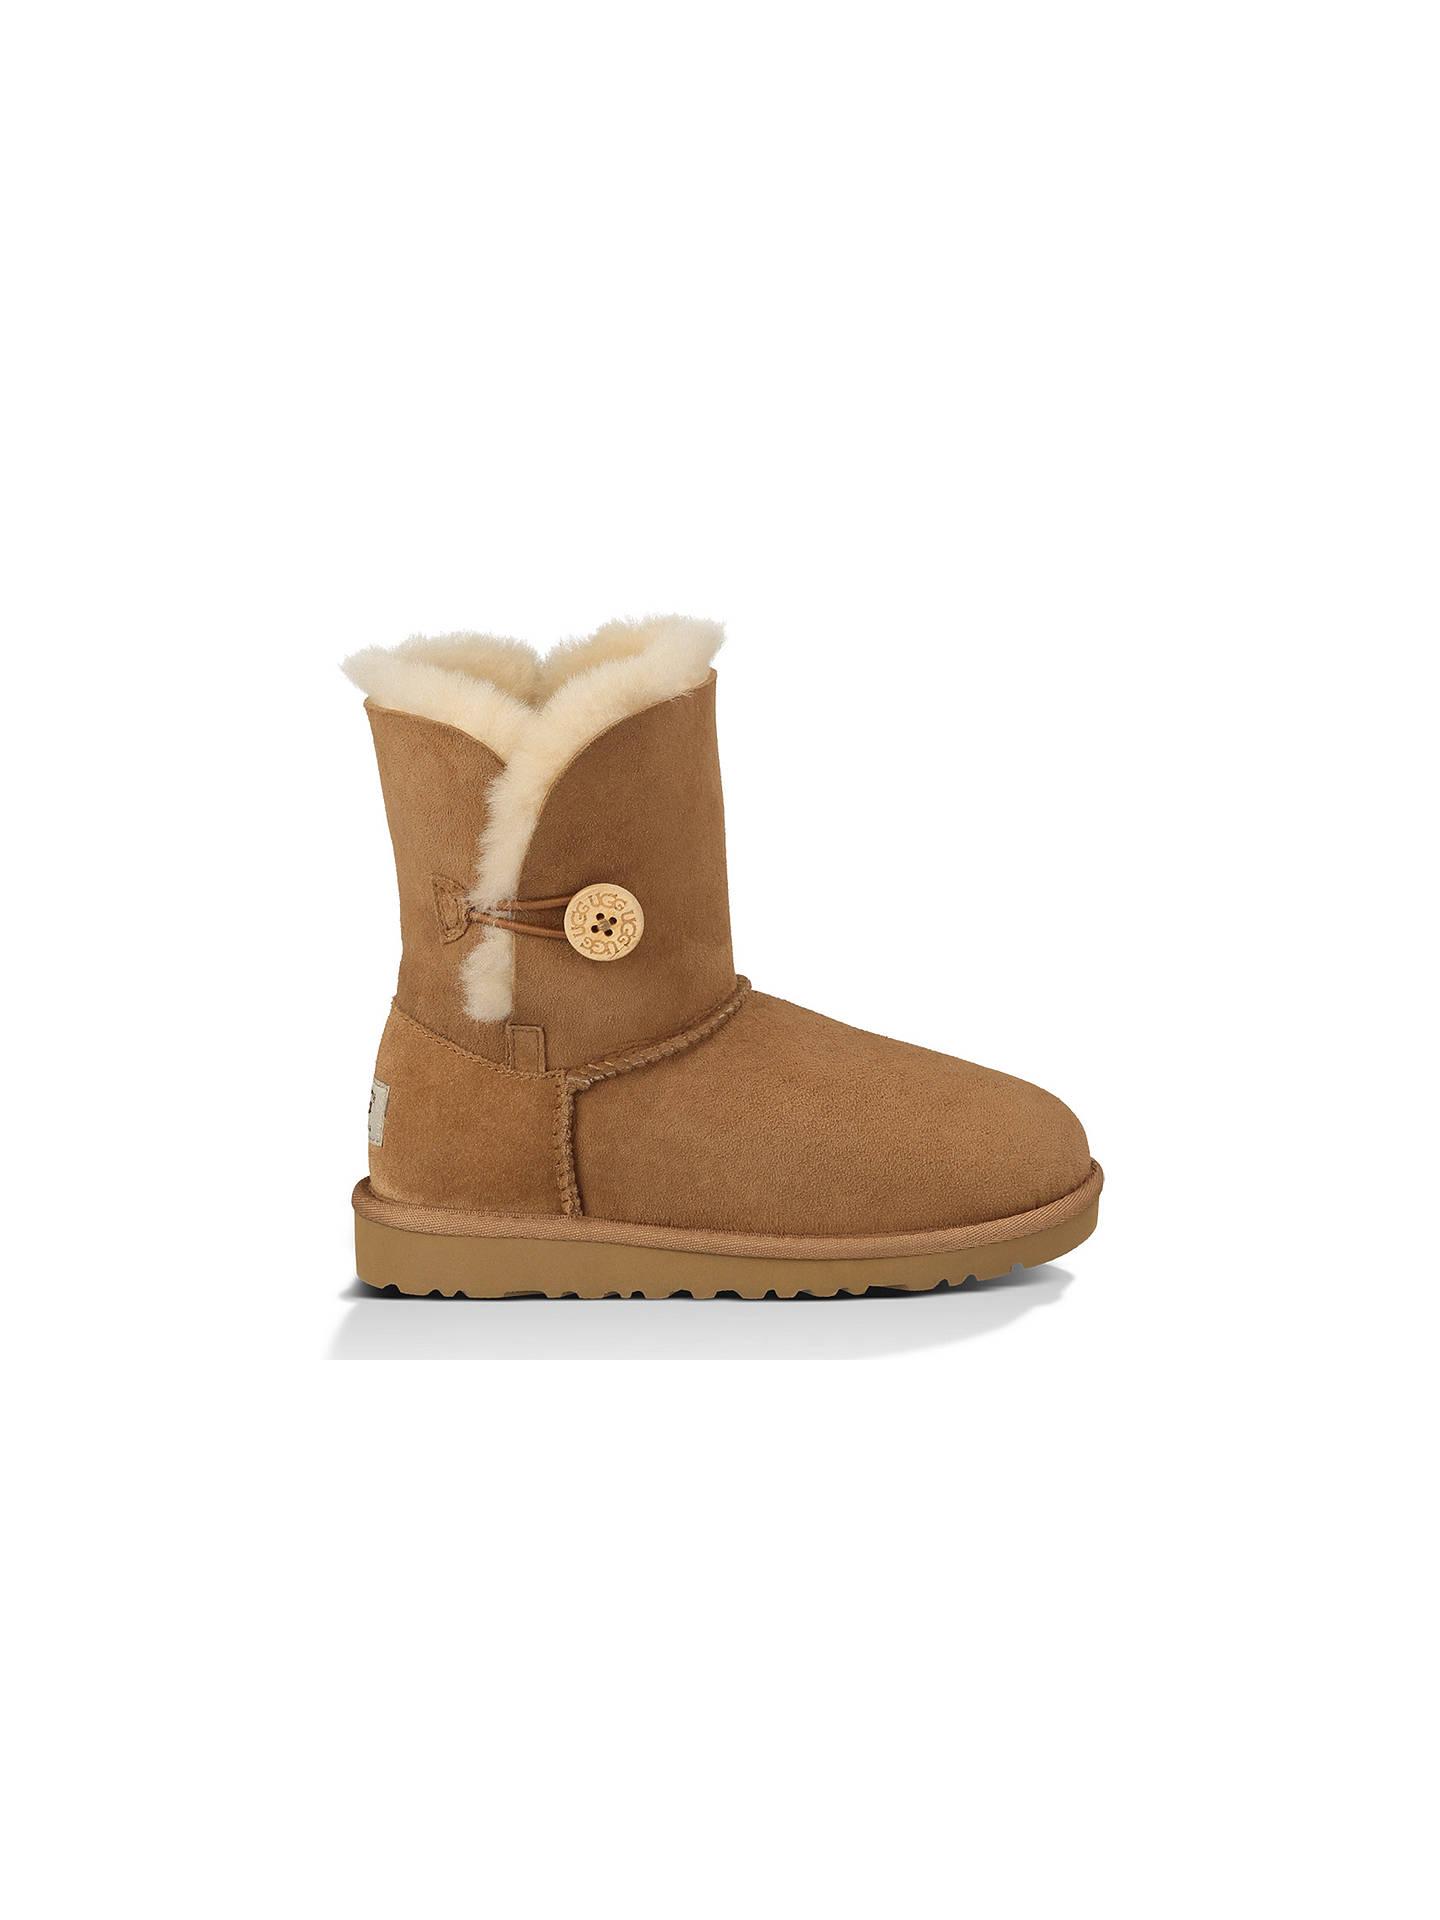 c4a6d44cf65 UGG Children's Bailey Button Boots, Chestnut at John Lewis & Partners